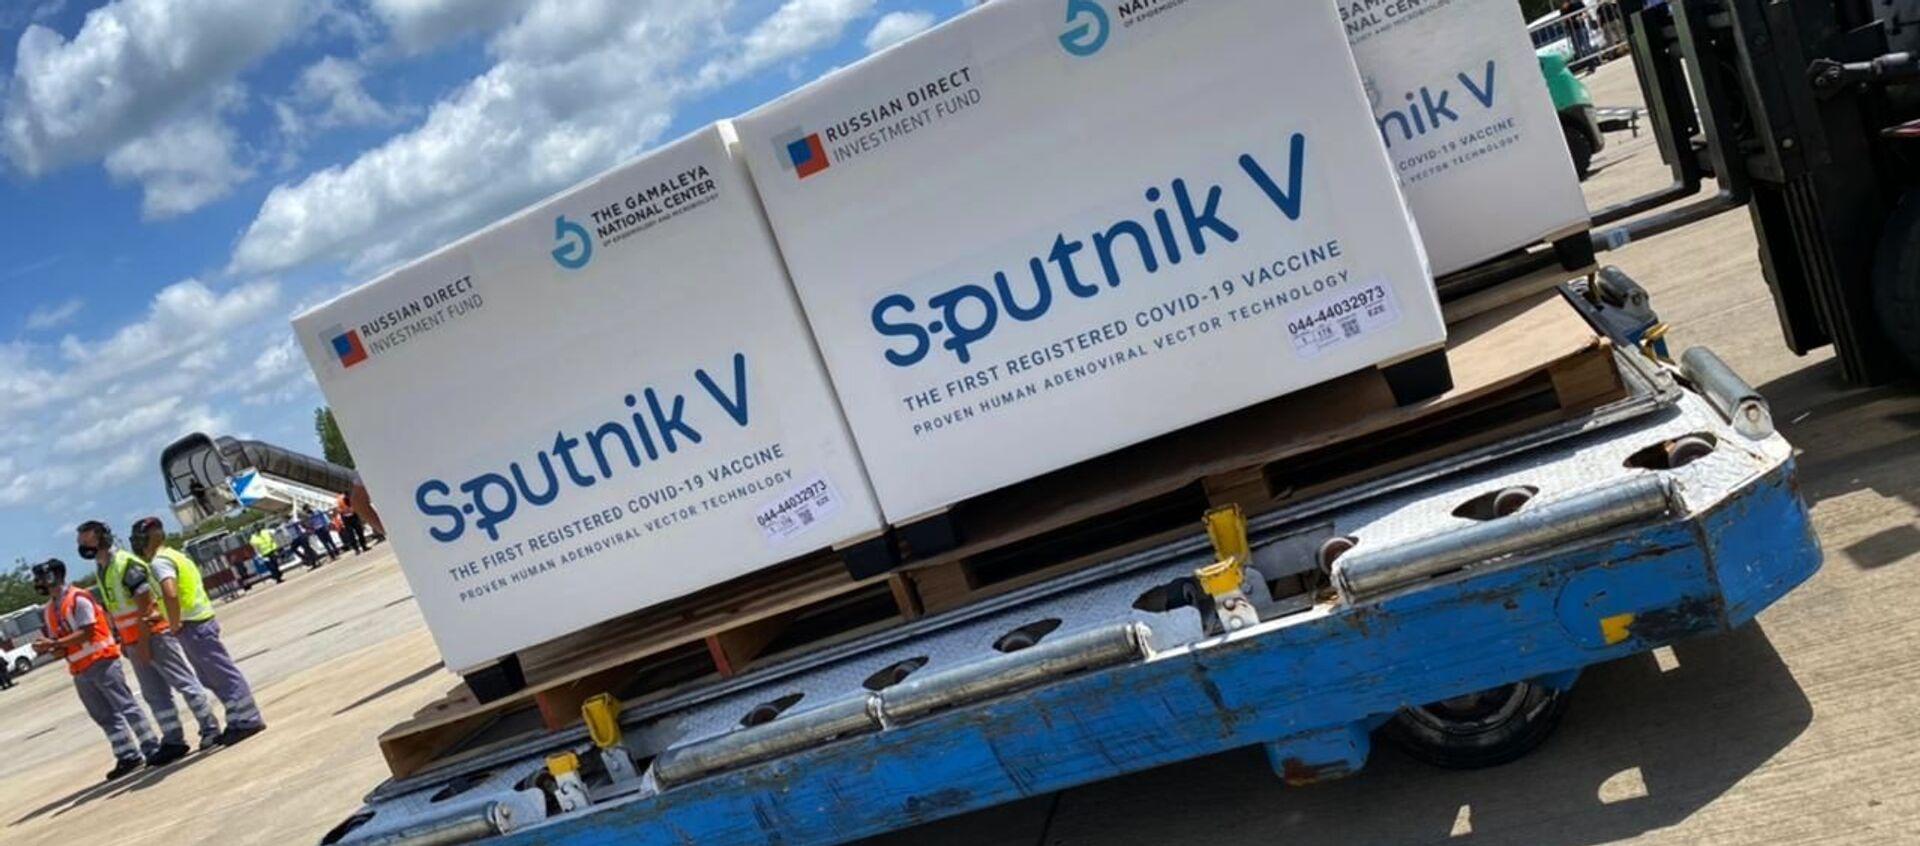 "Rosyjska szczepionka ""Sputnik V"" na lotnisku w Buenos Aires - Sputnik Polska, 1920, 18.02.2021"